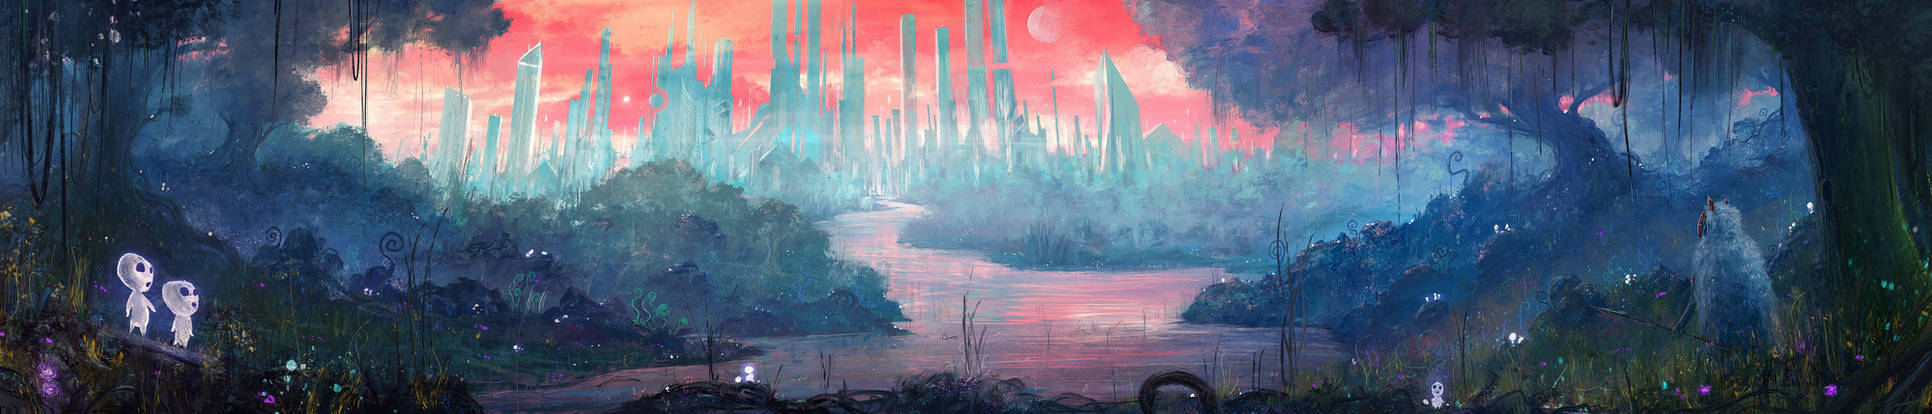 Princess Mononoke journey into the future